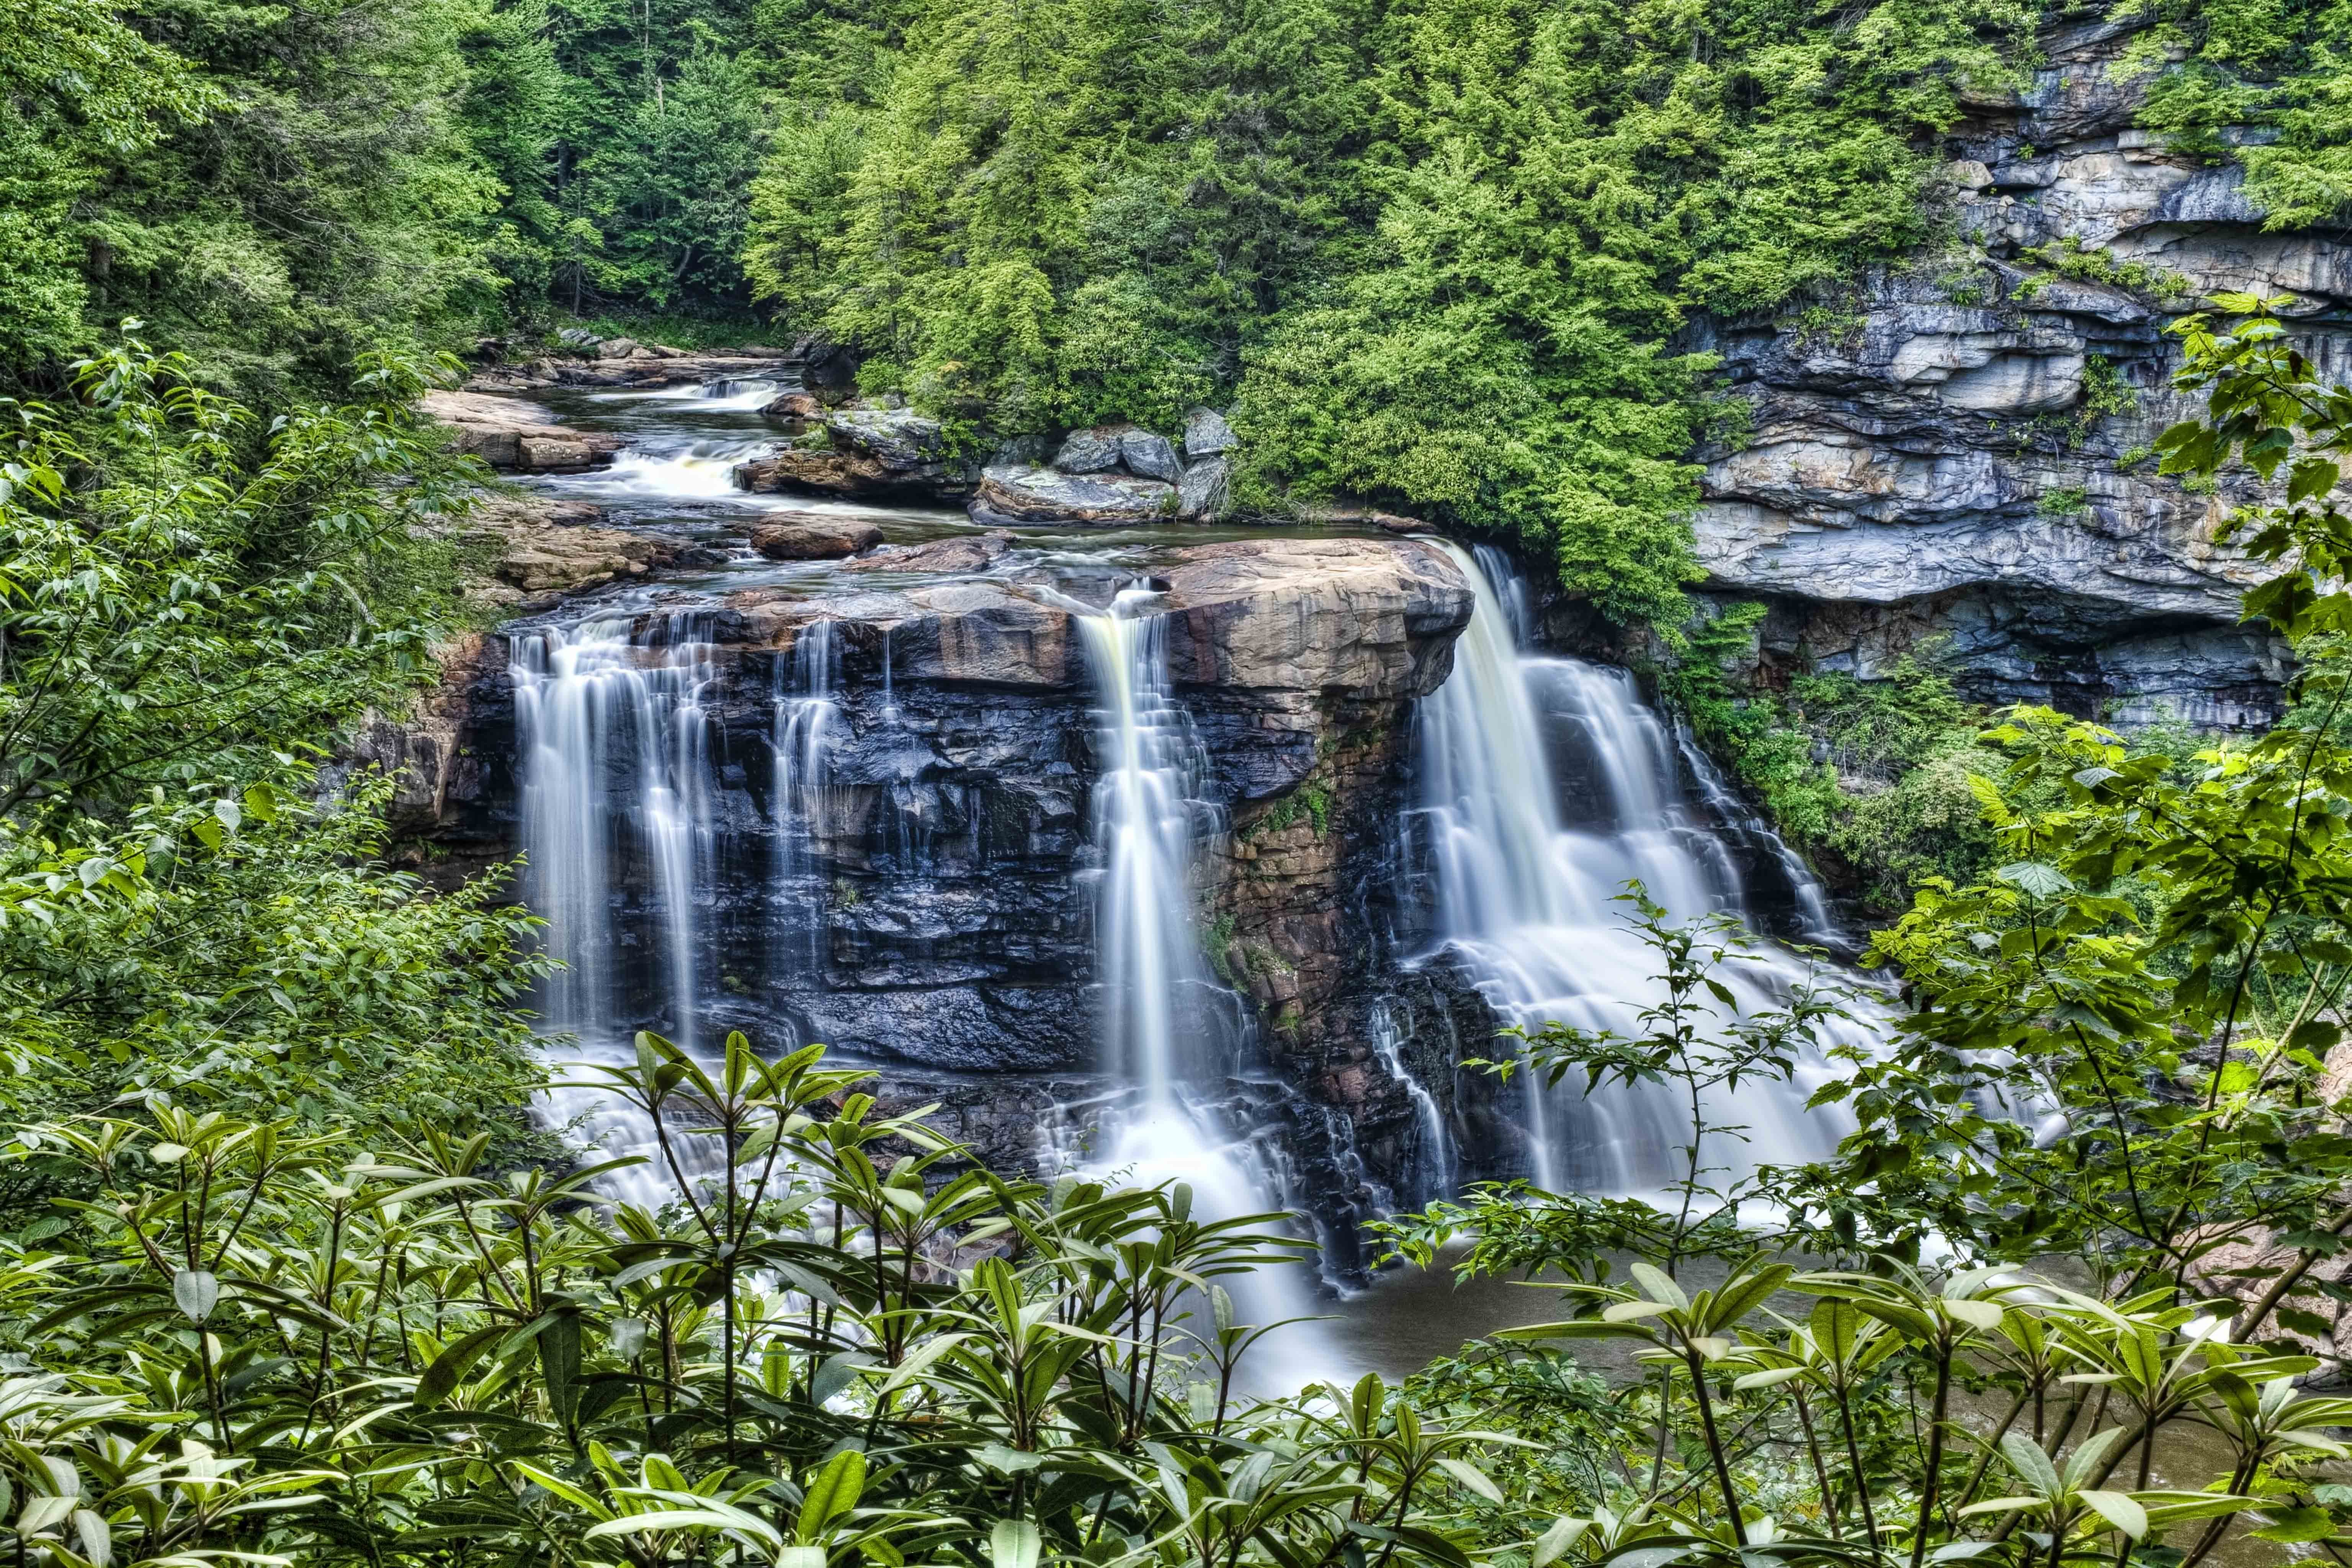 Hdr Hdr Hdr Black River Falls Blackwater Falls Black River Falls Most Beautiful Places